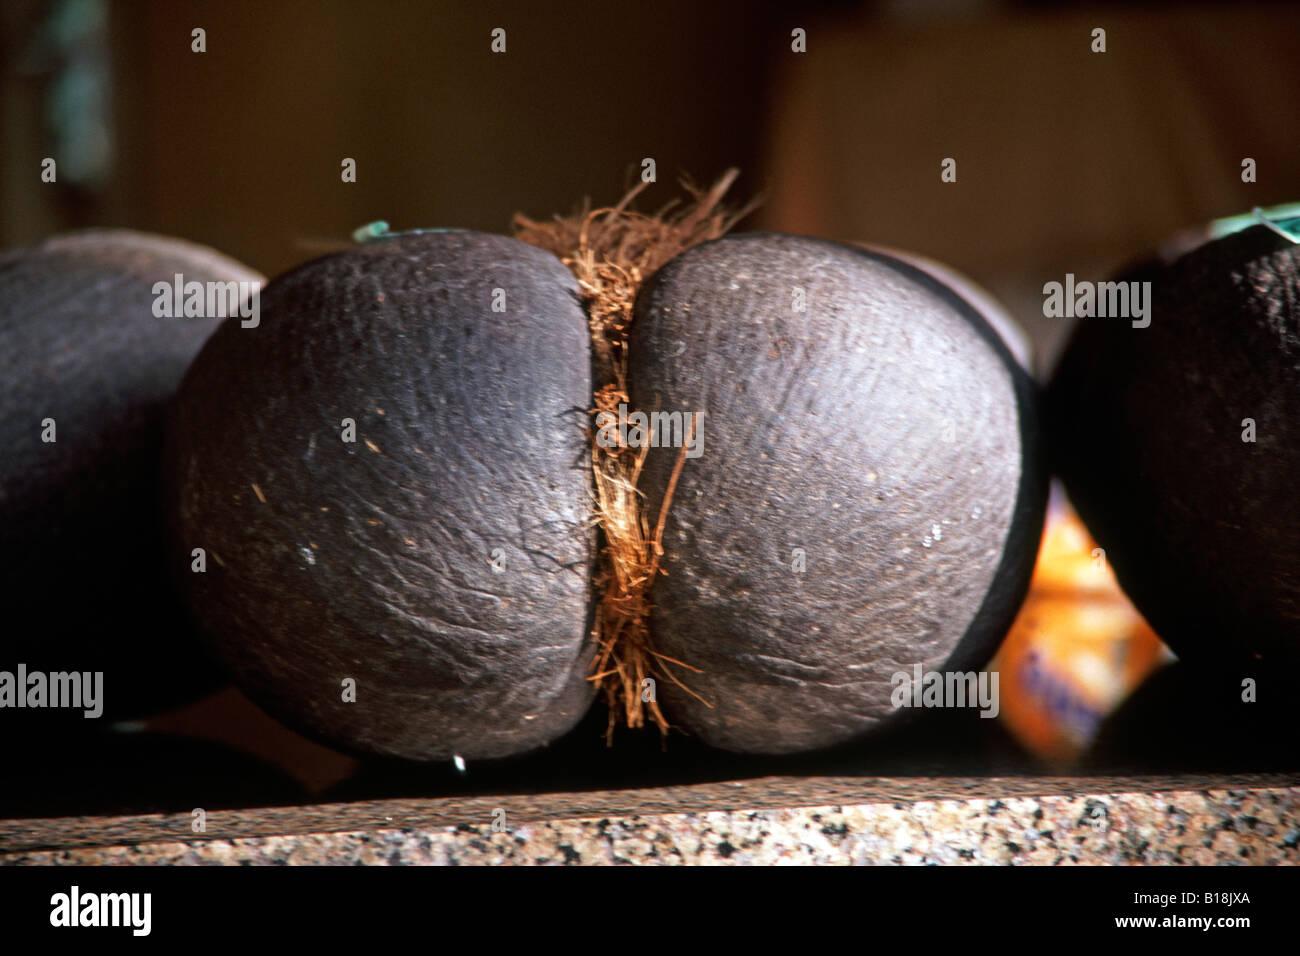 Coco De Mer Nut For Sale In Victoria Market Mahe Seychelles - Seychelles victoria map indian ocean